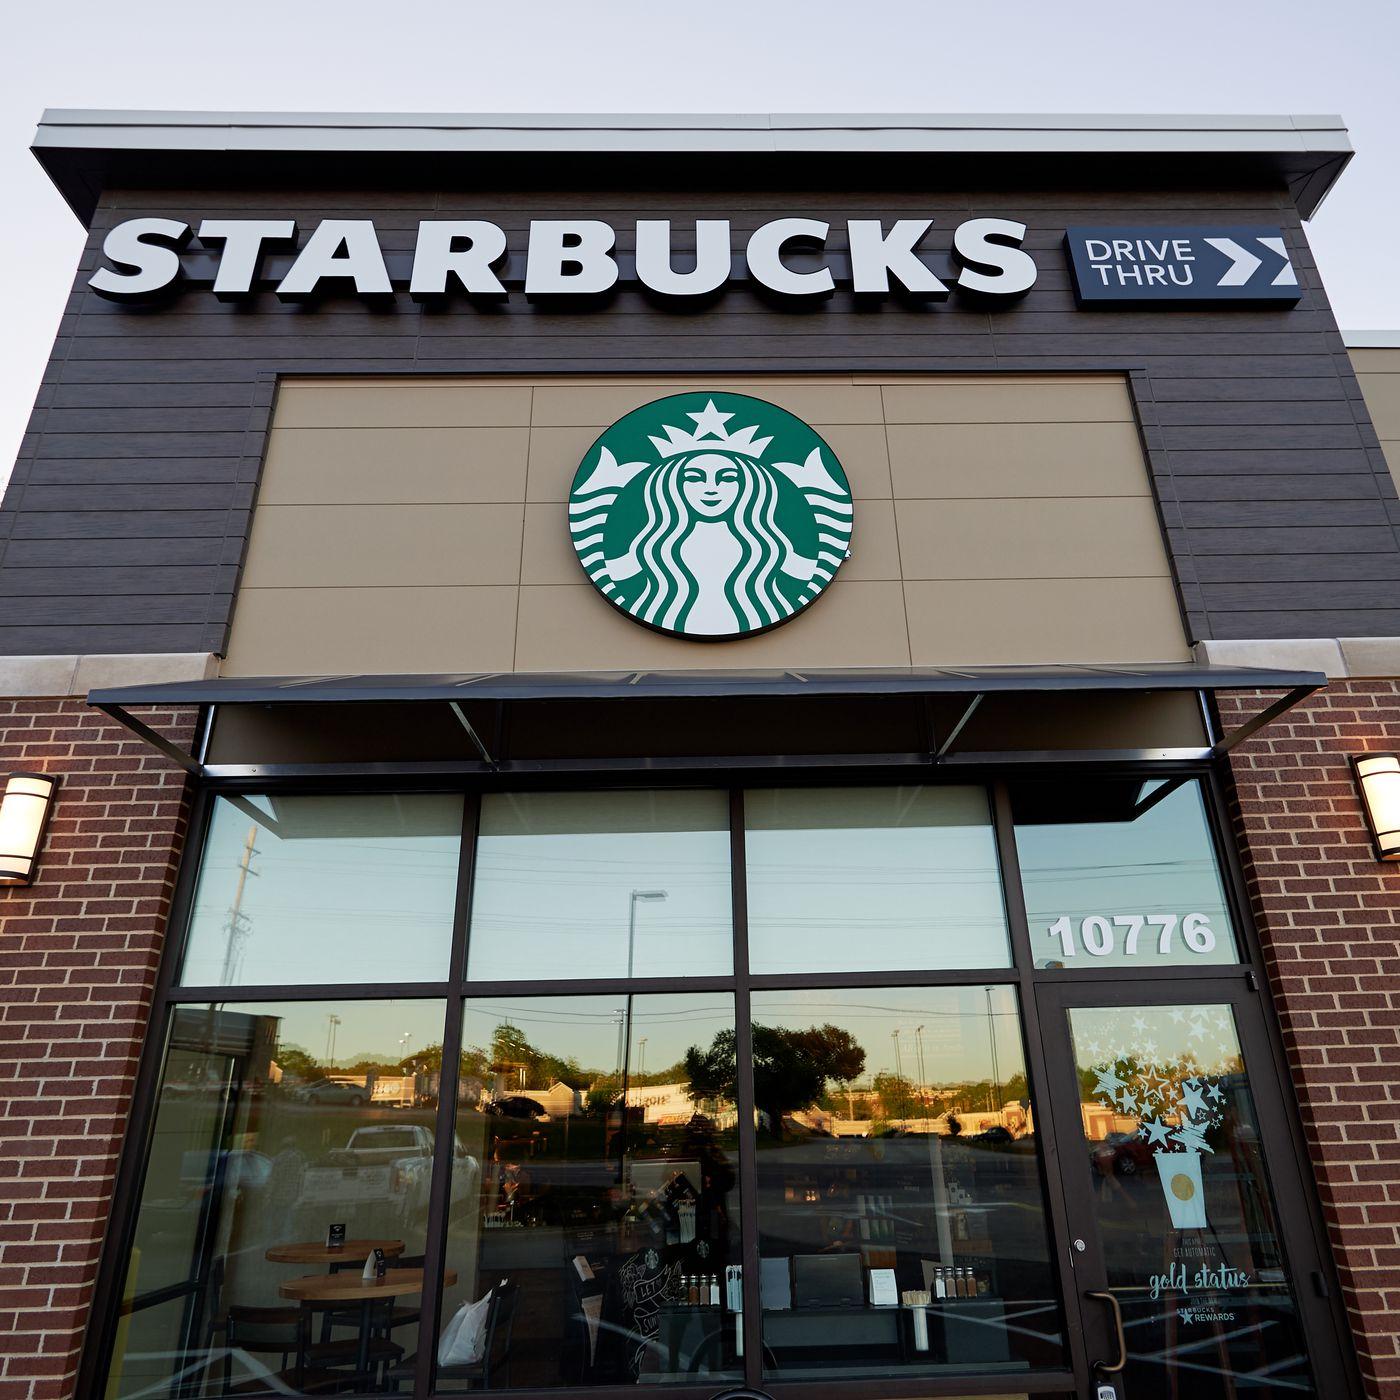 Starbucks Opens First Location in Ferguson, Missouri - Eater